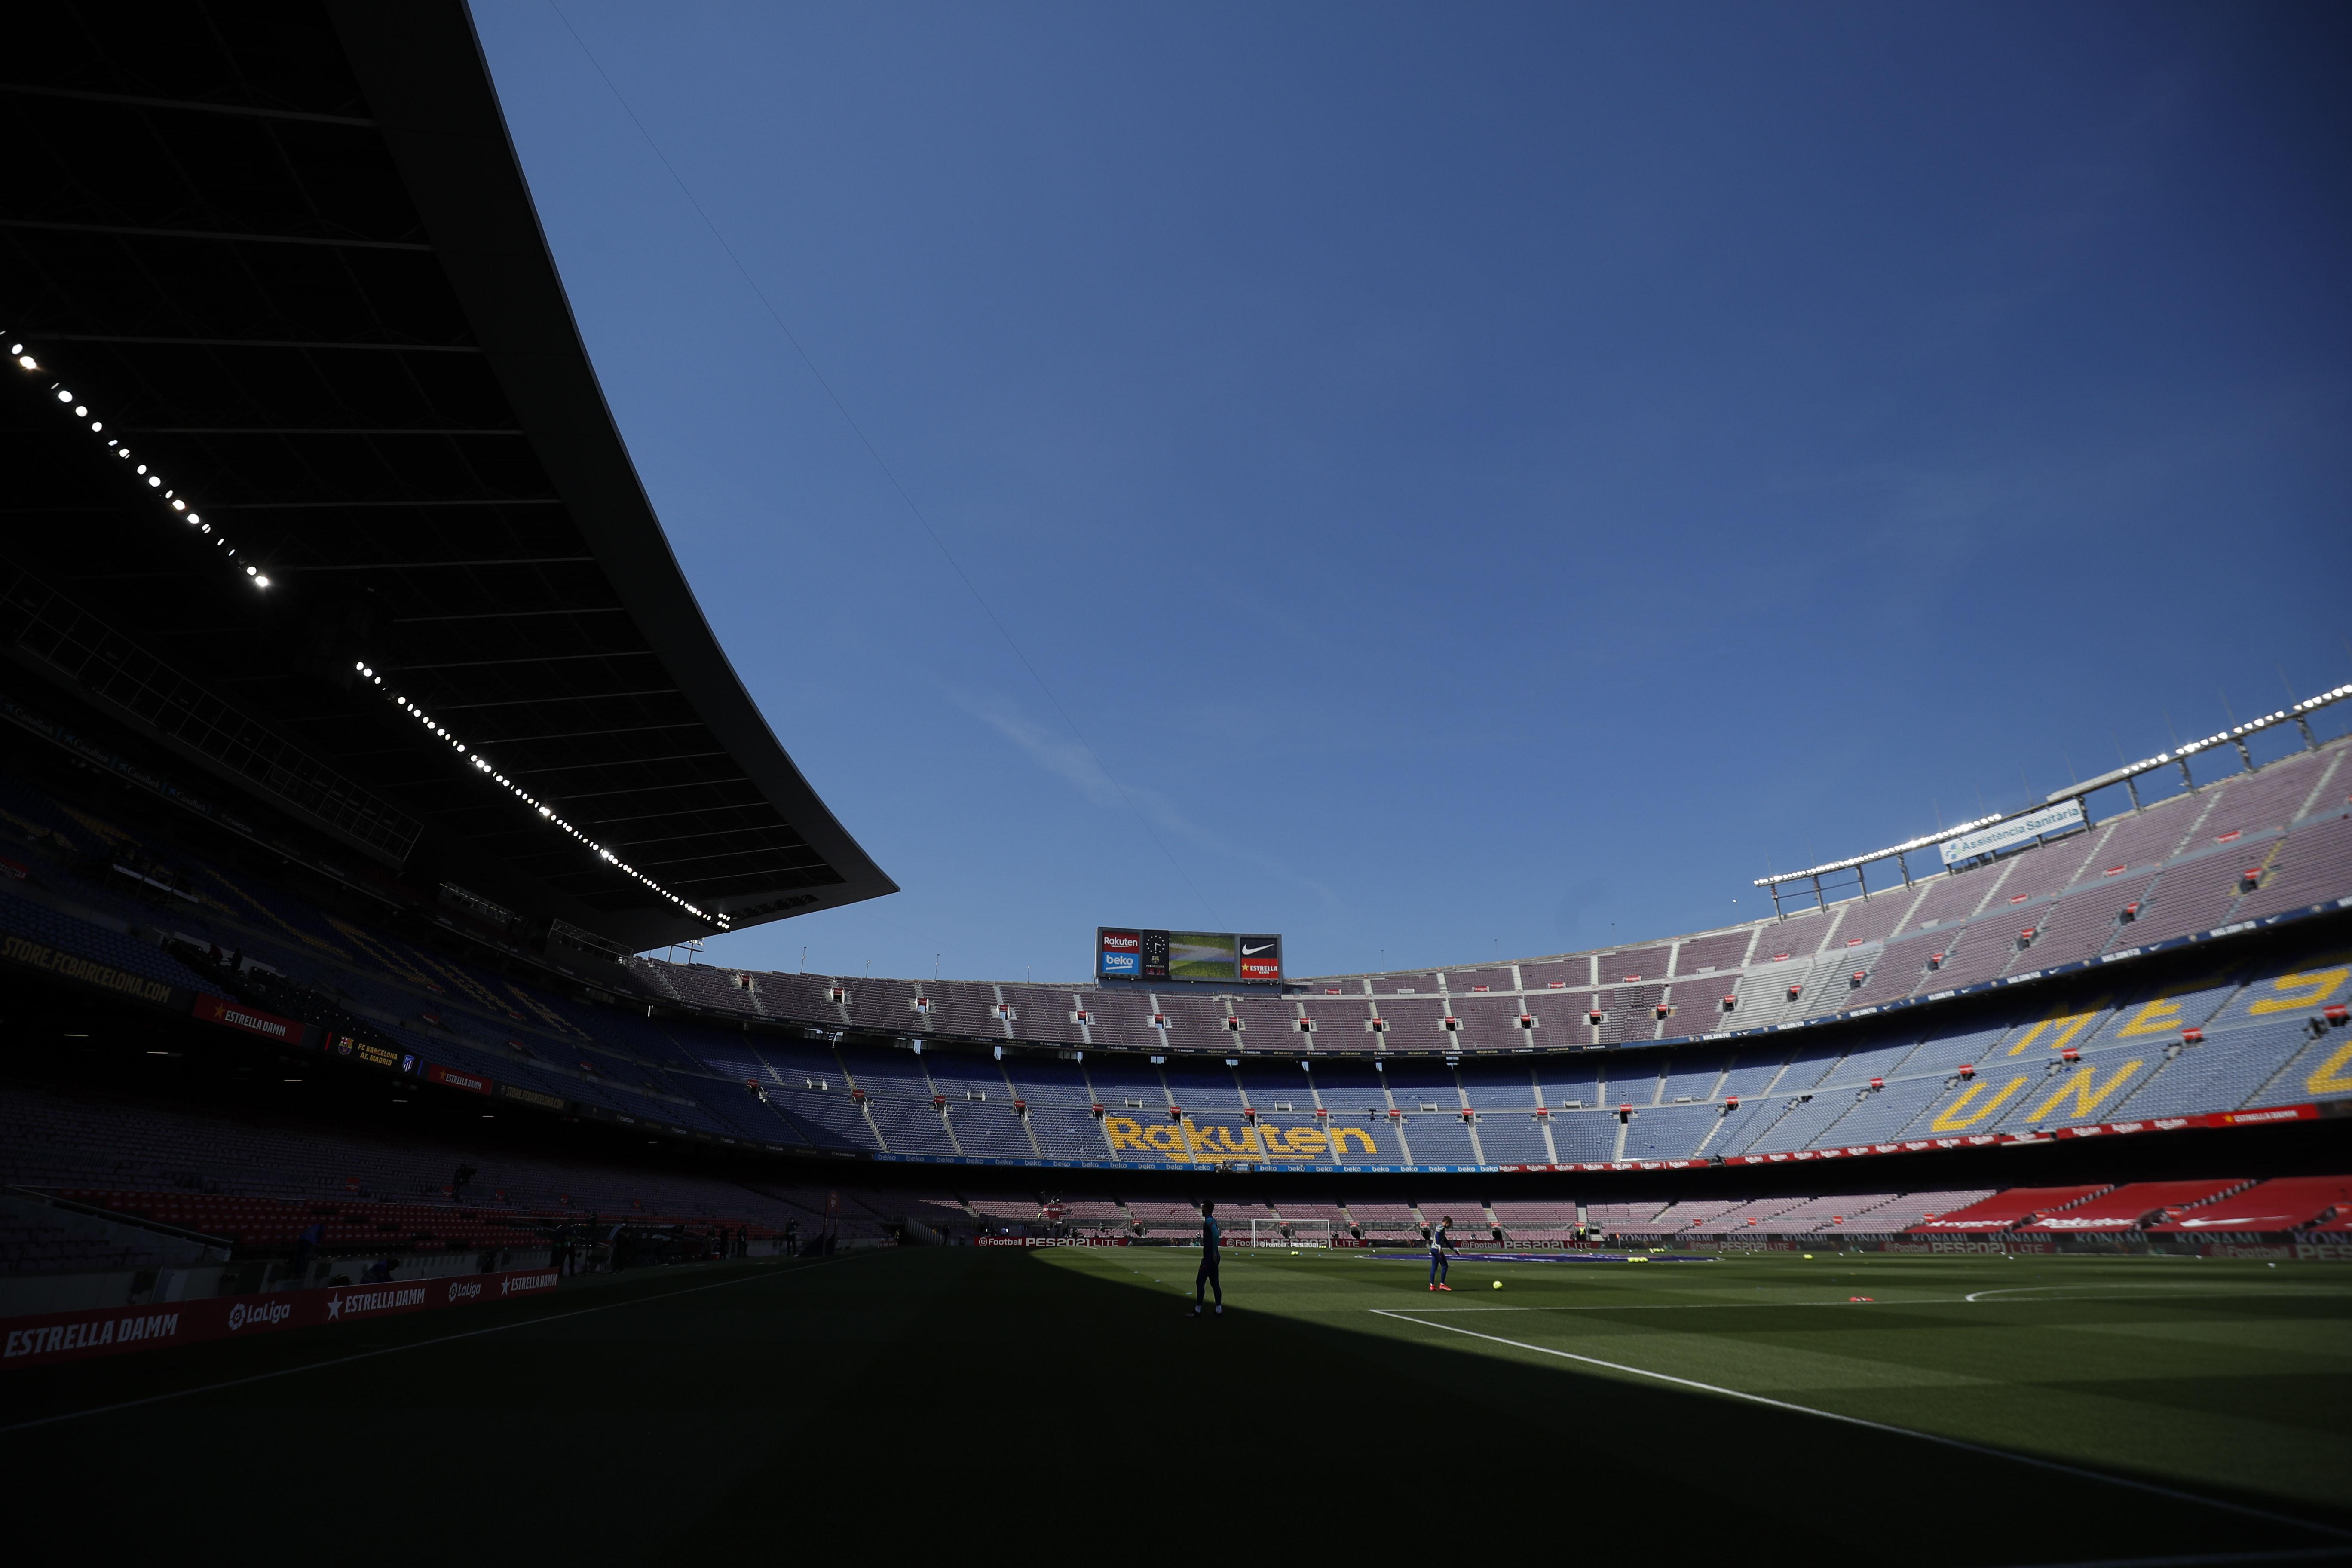 Soccer Football - La Liga Santander - FC Barcelona v Atletico Madrid - Camp Nou, Barcelona, Spain - May 8, 2021 General view inside the stadium before the match REUTERS/Albert Gea/File Photo